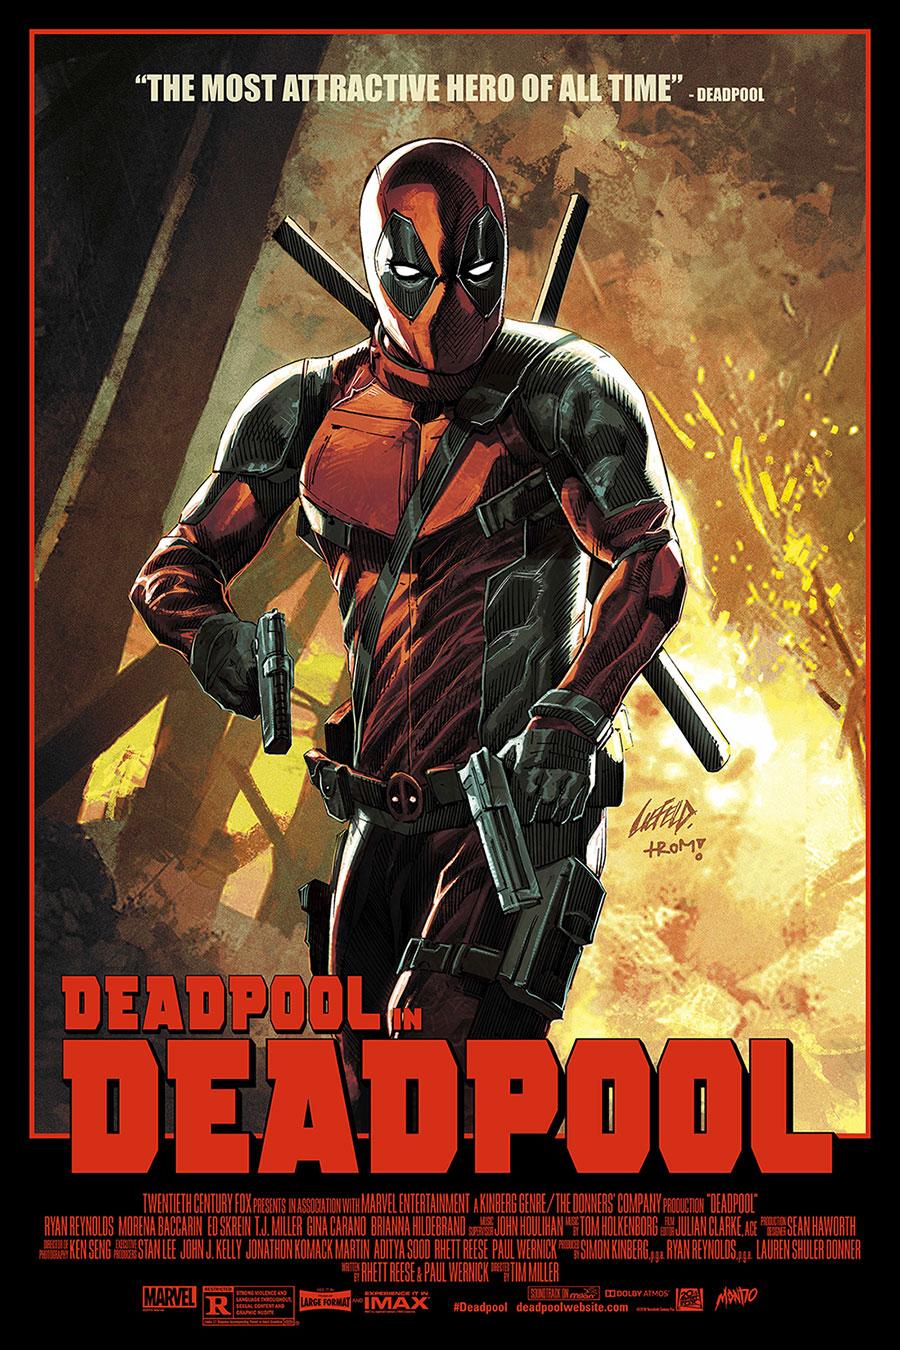 Deadpool regular